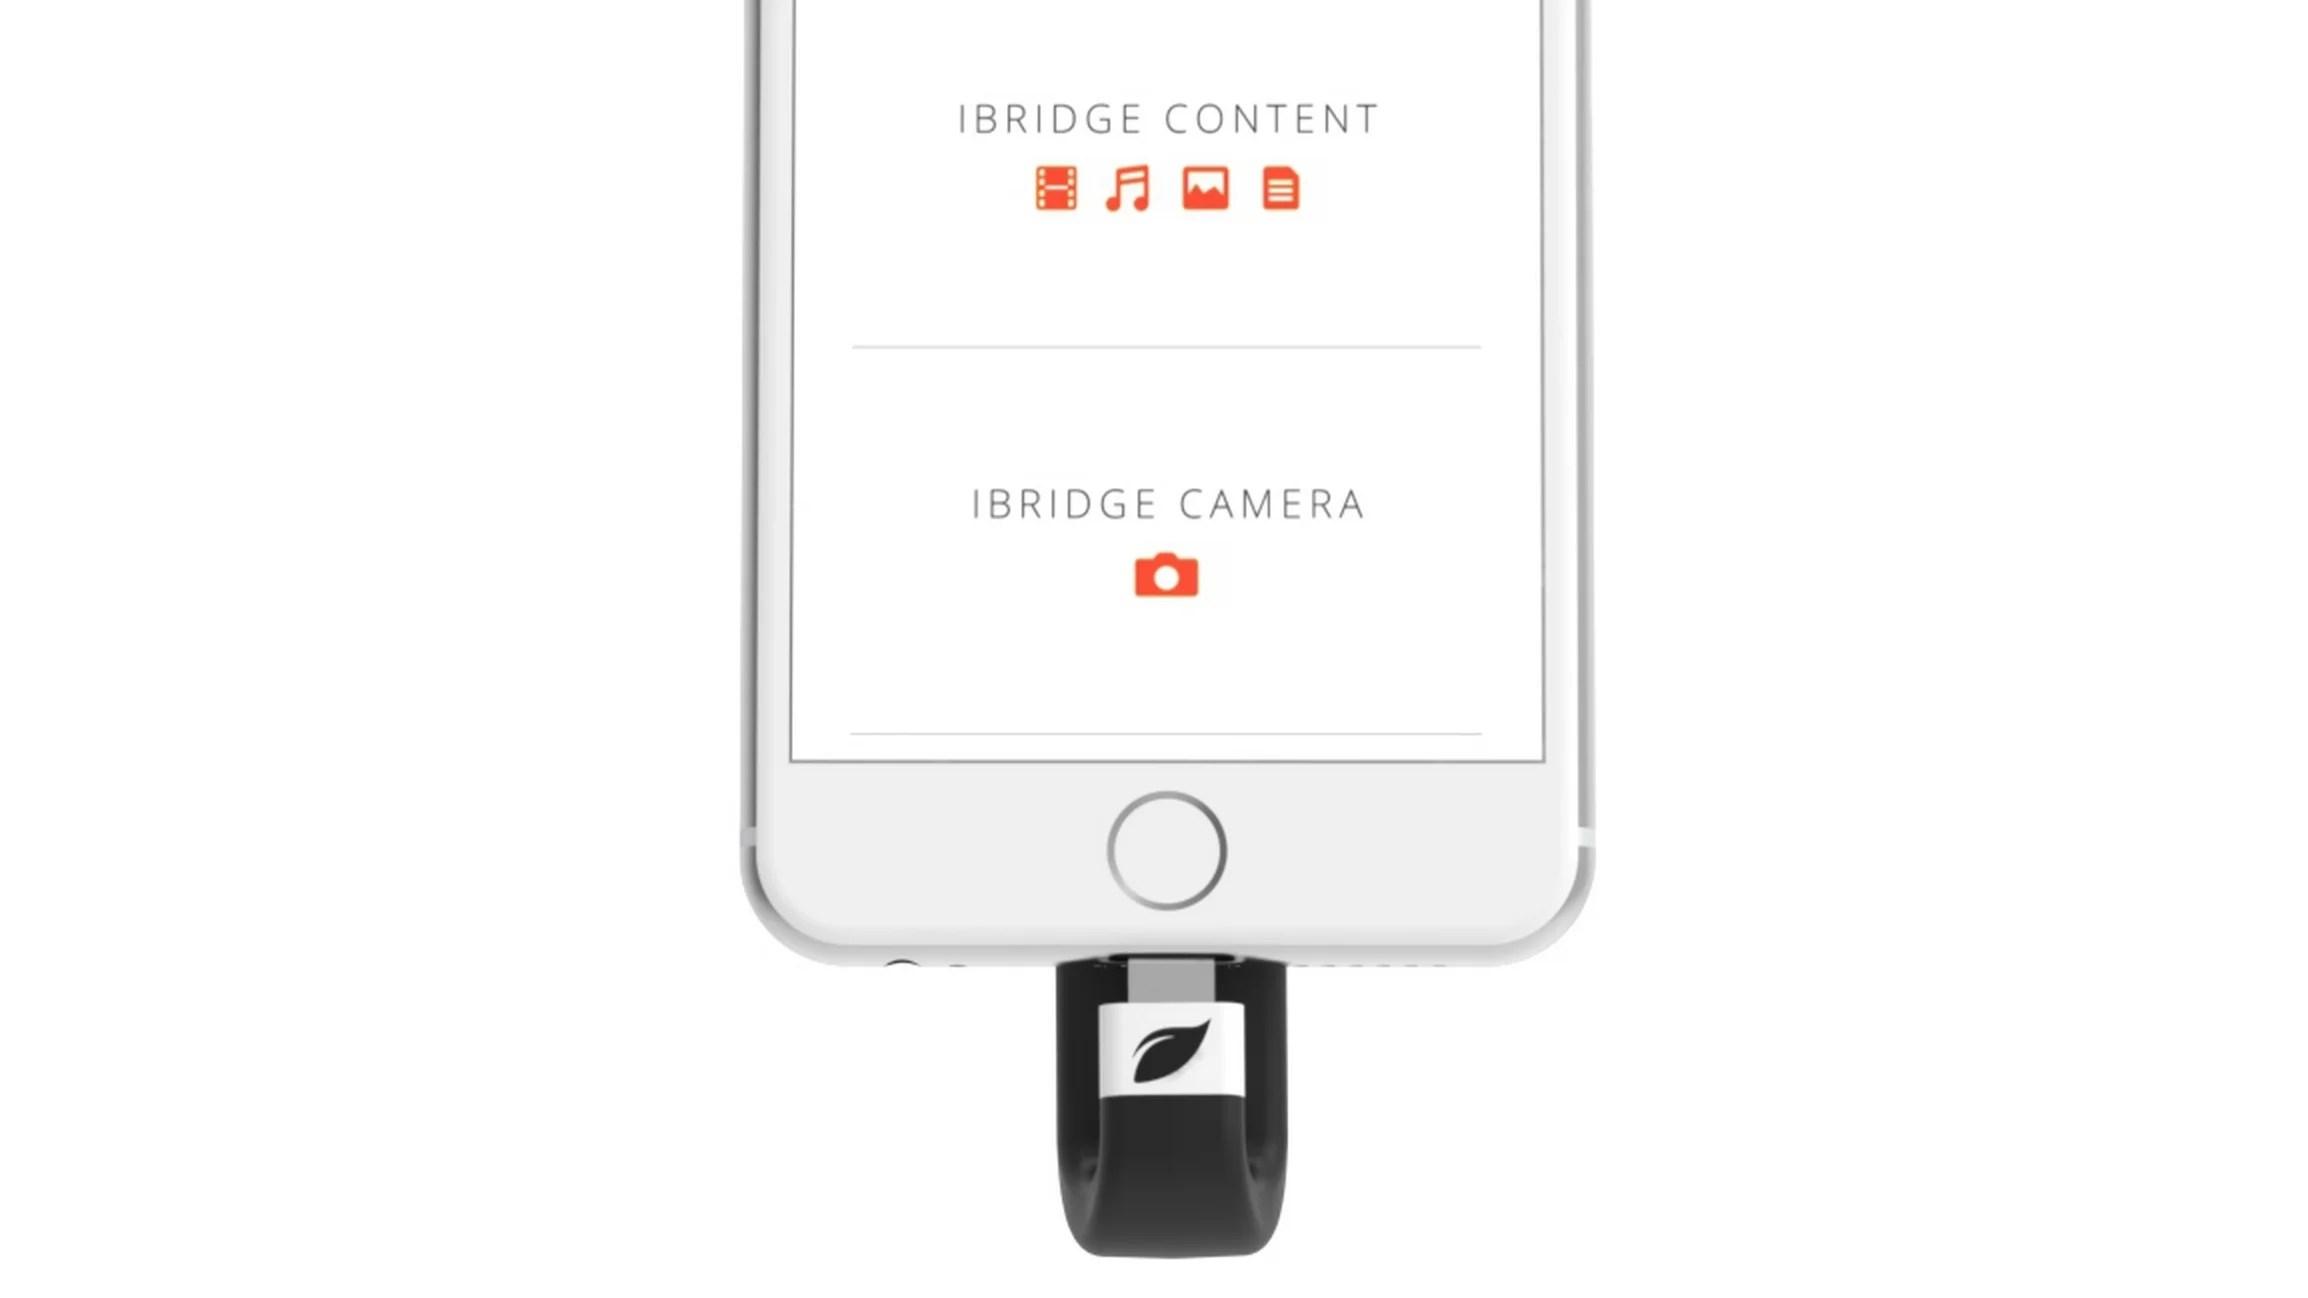 Who needs USB OTG? Leef iBRIDGE uses lightning adapter for